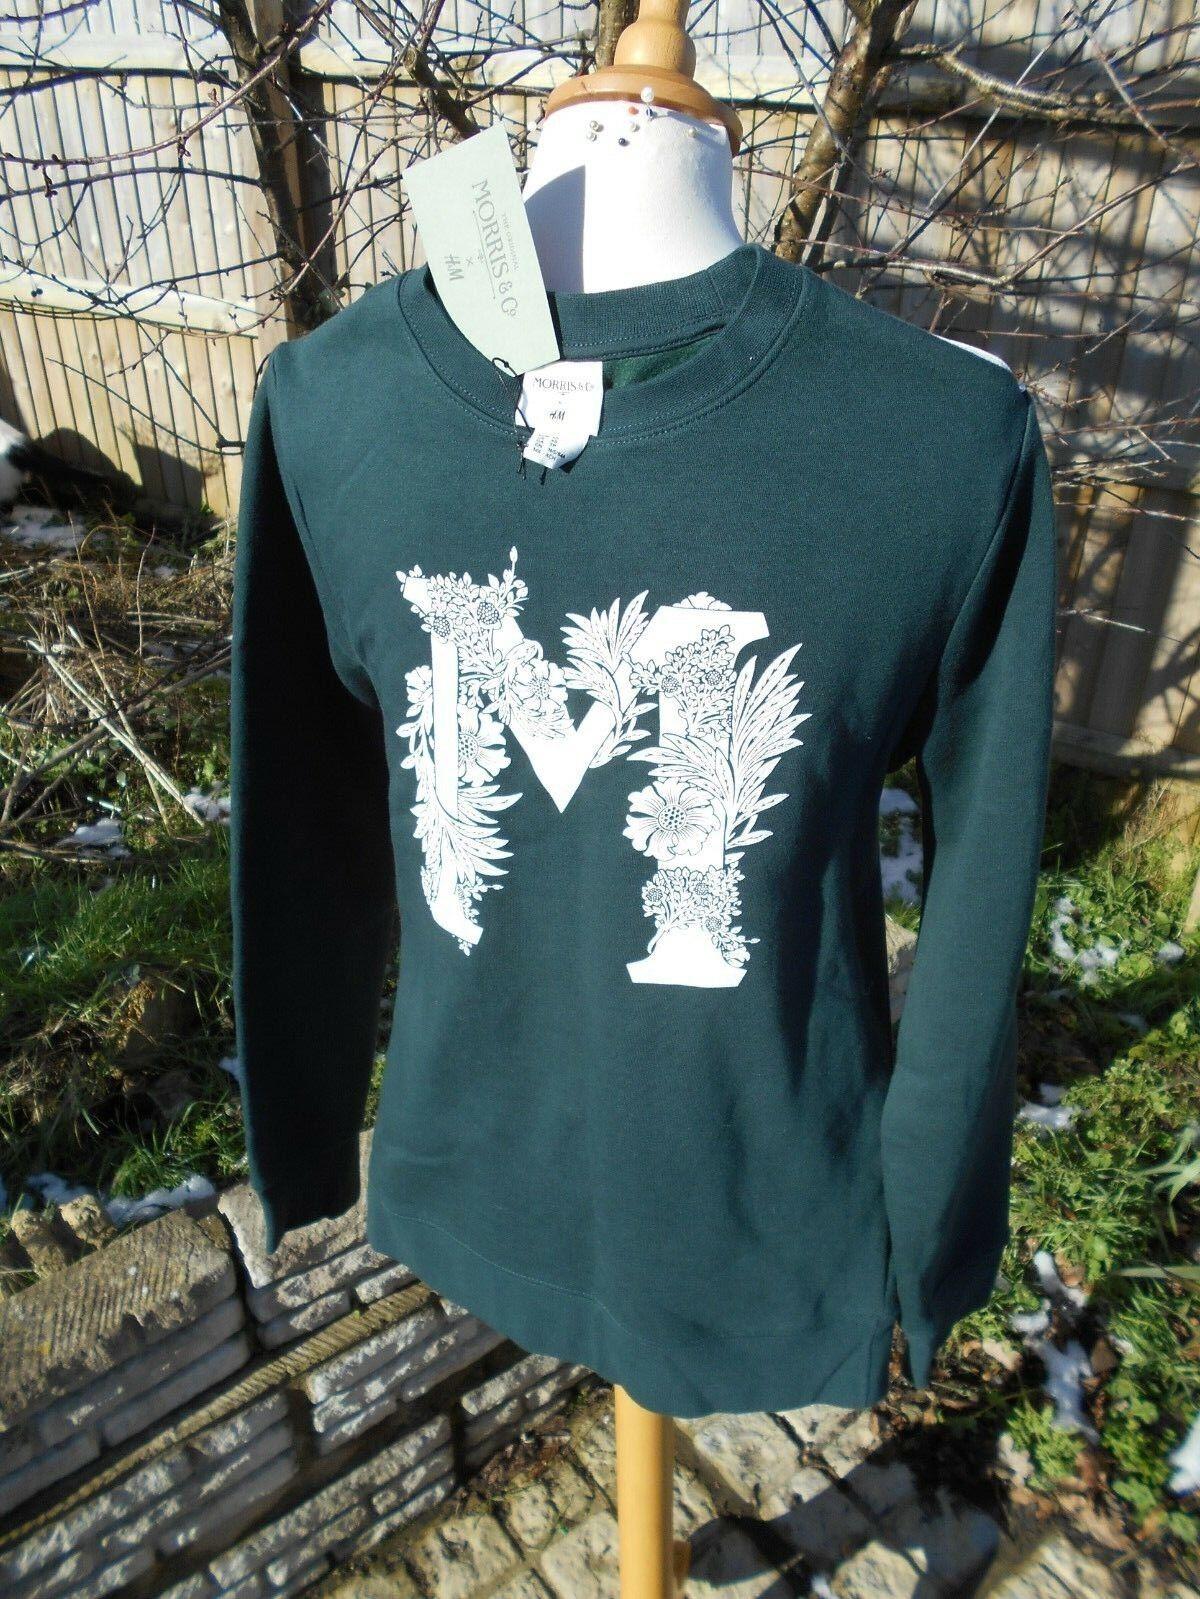 H&M x William Morris & Co Men's jumper sweater winter warm blogger L BNWT GREEN